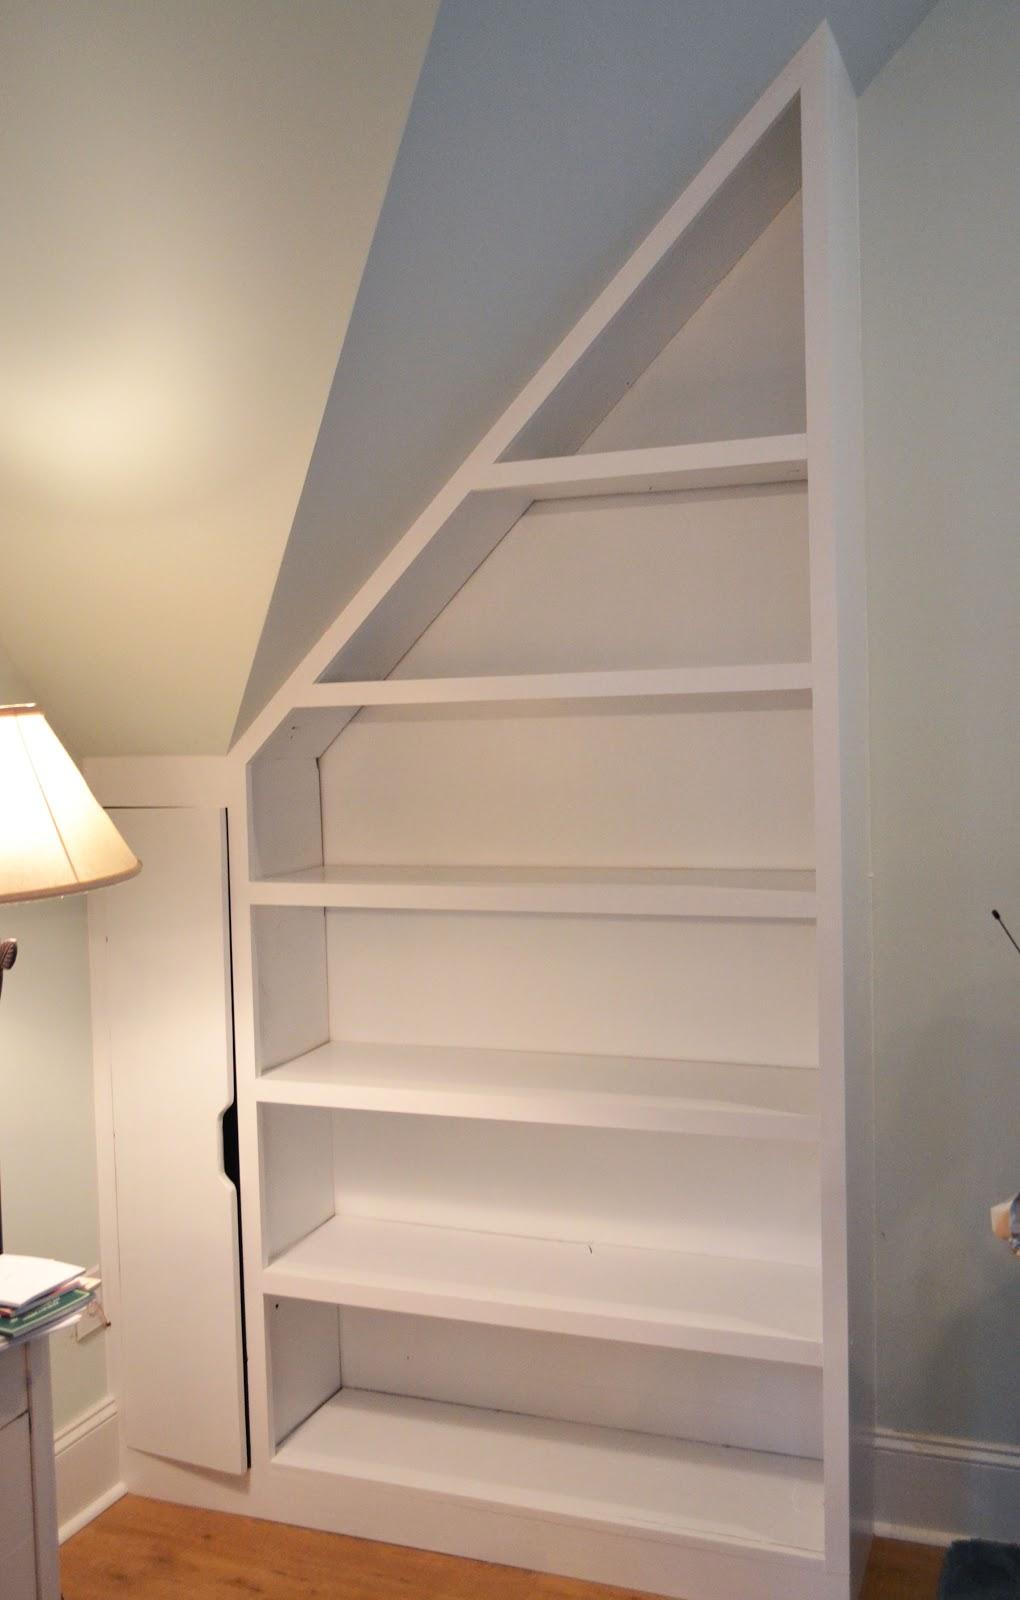 A Work In Progress Finally A Bookshelf